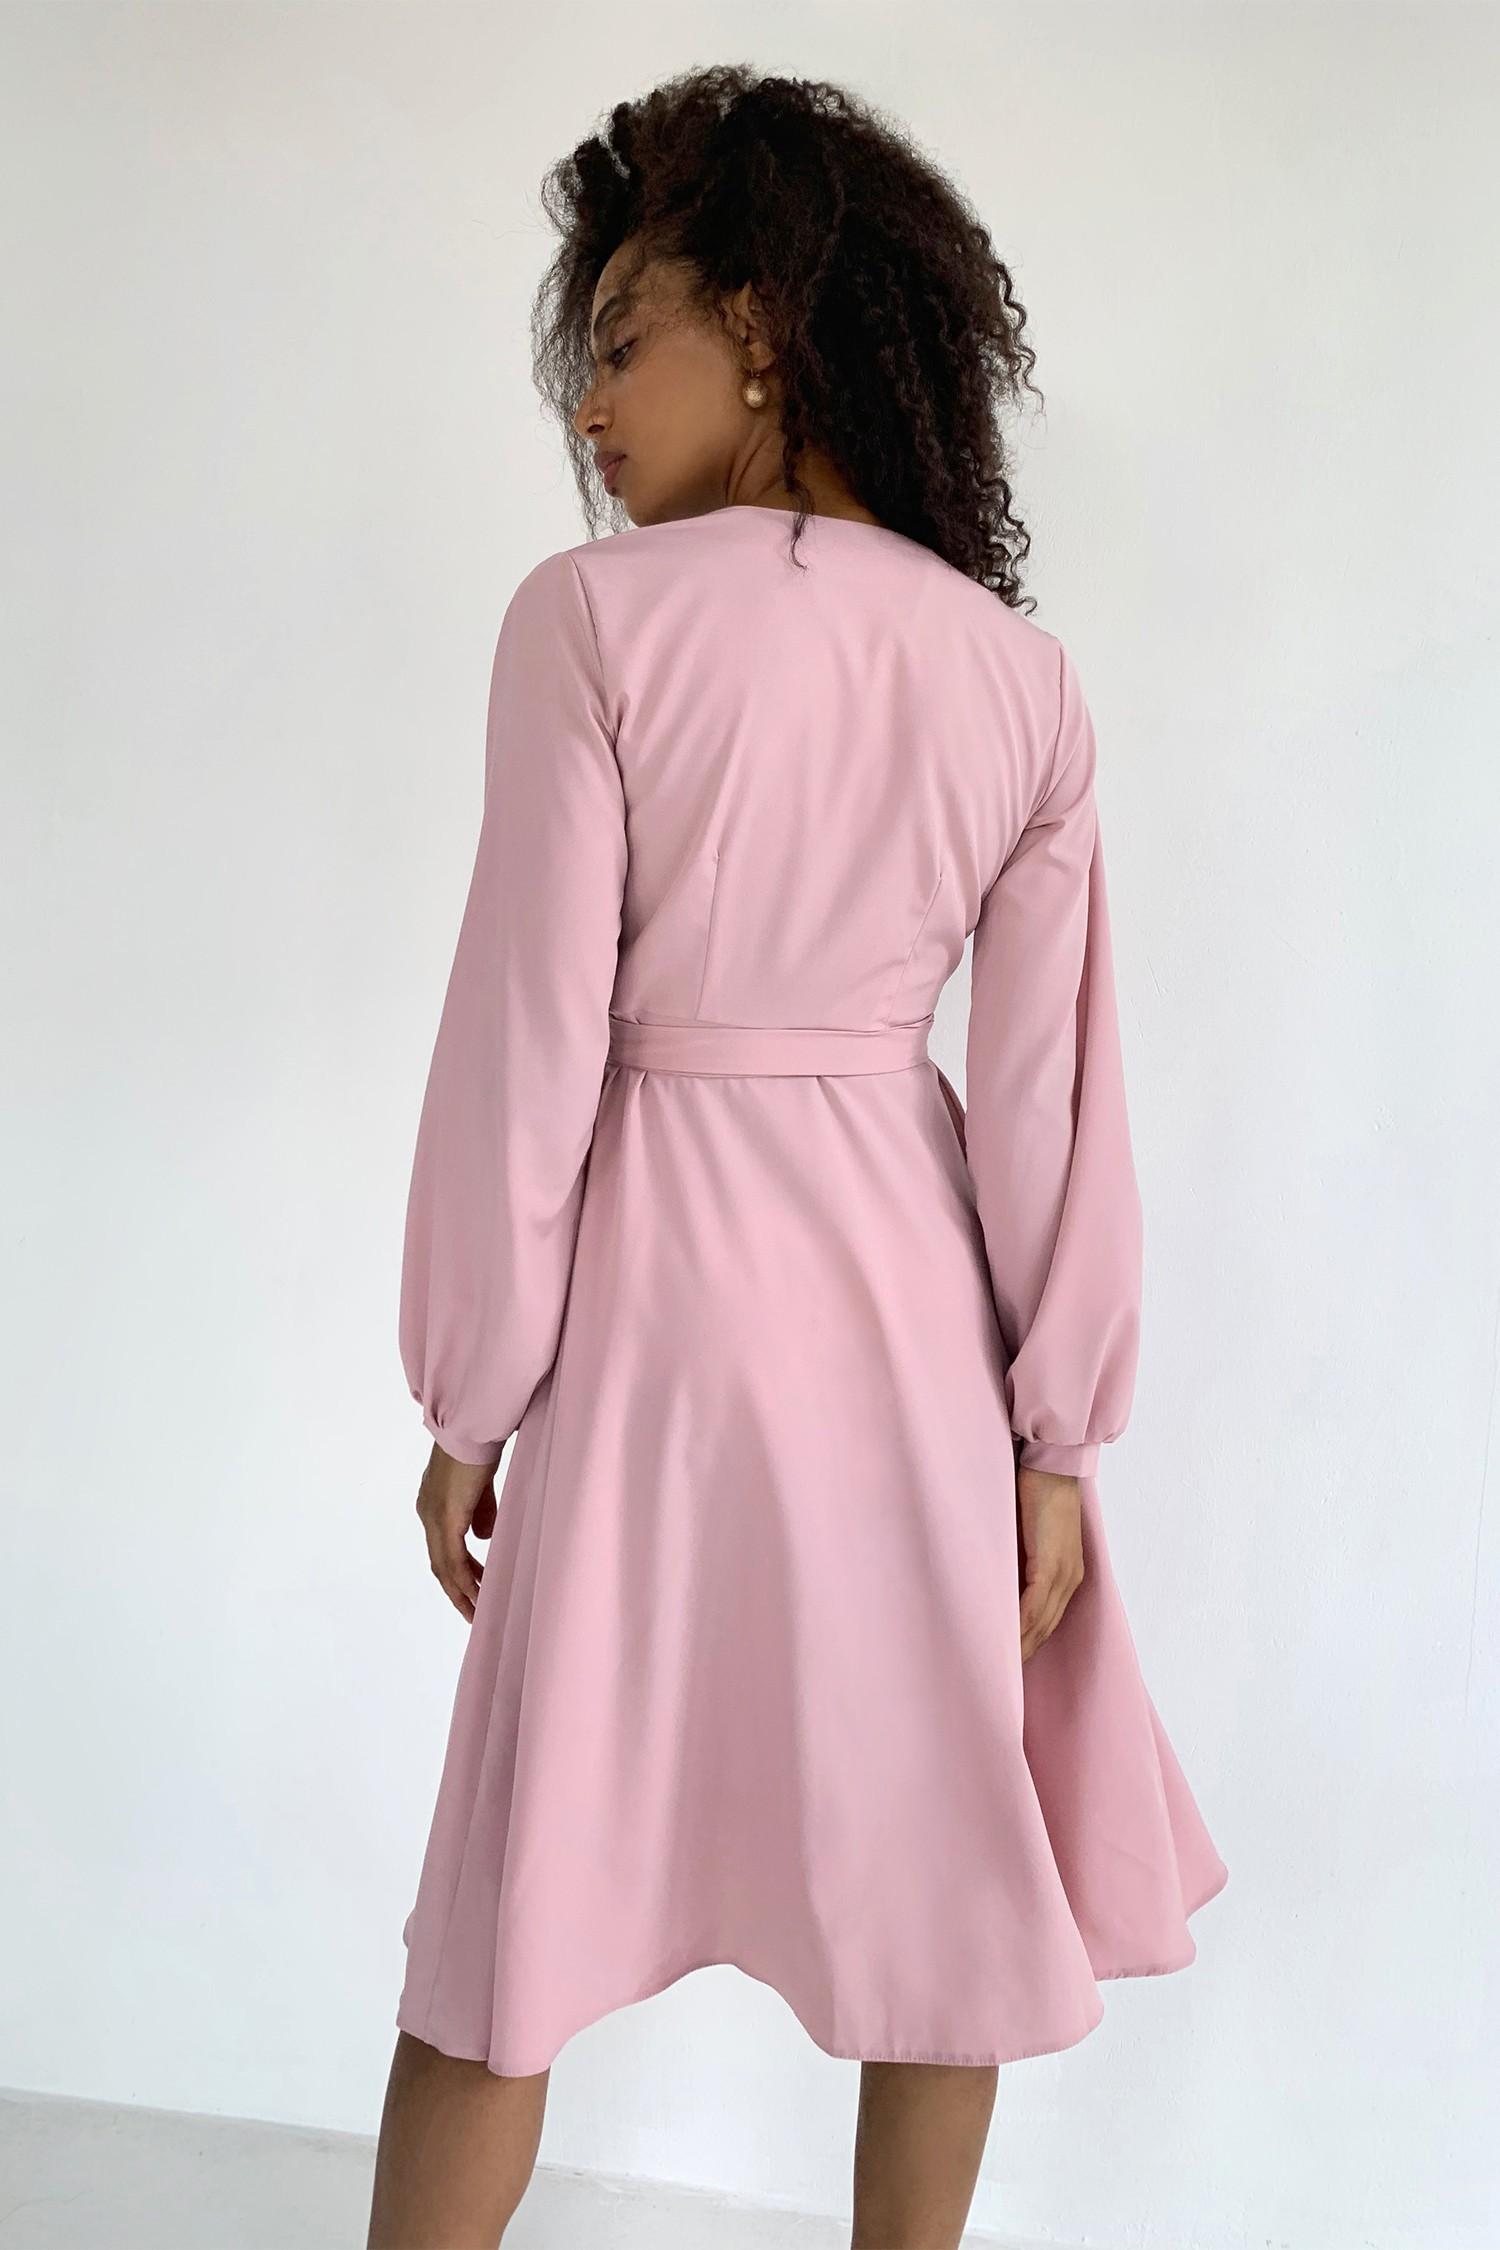 Платье миди на запах пудровое - THE LACE